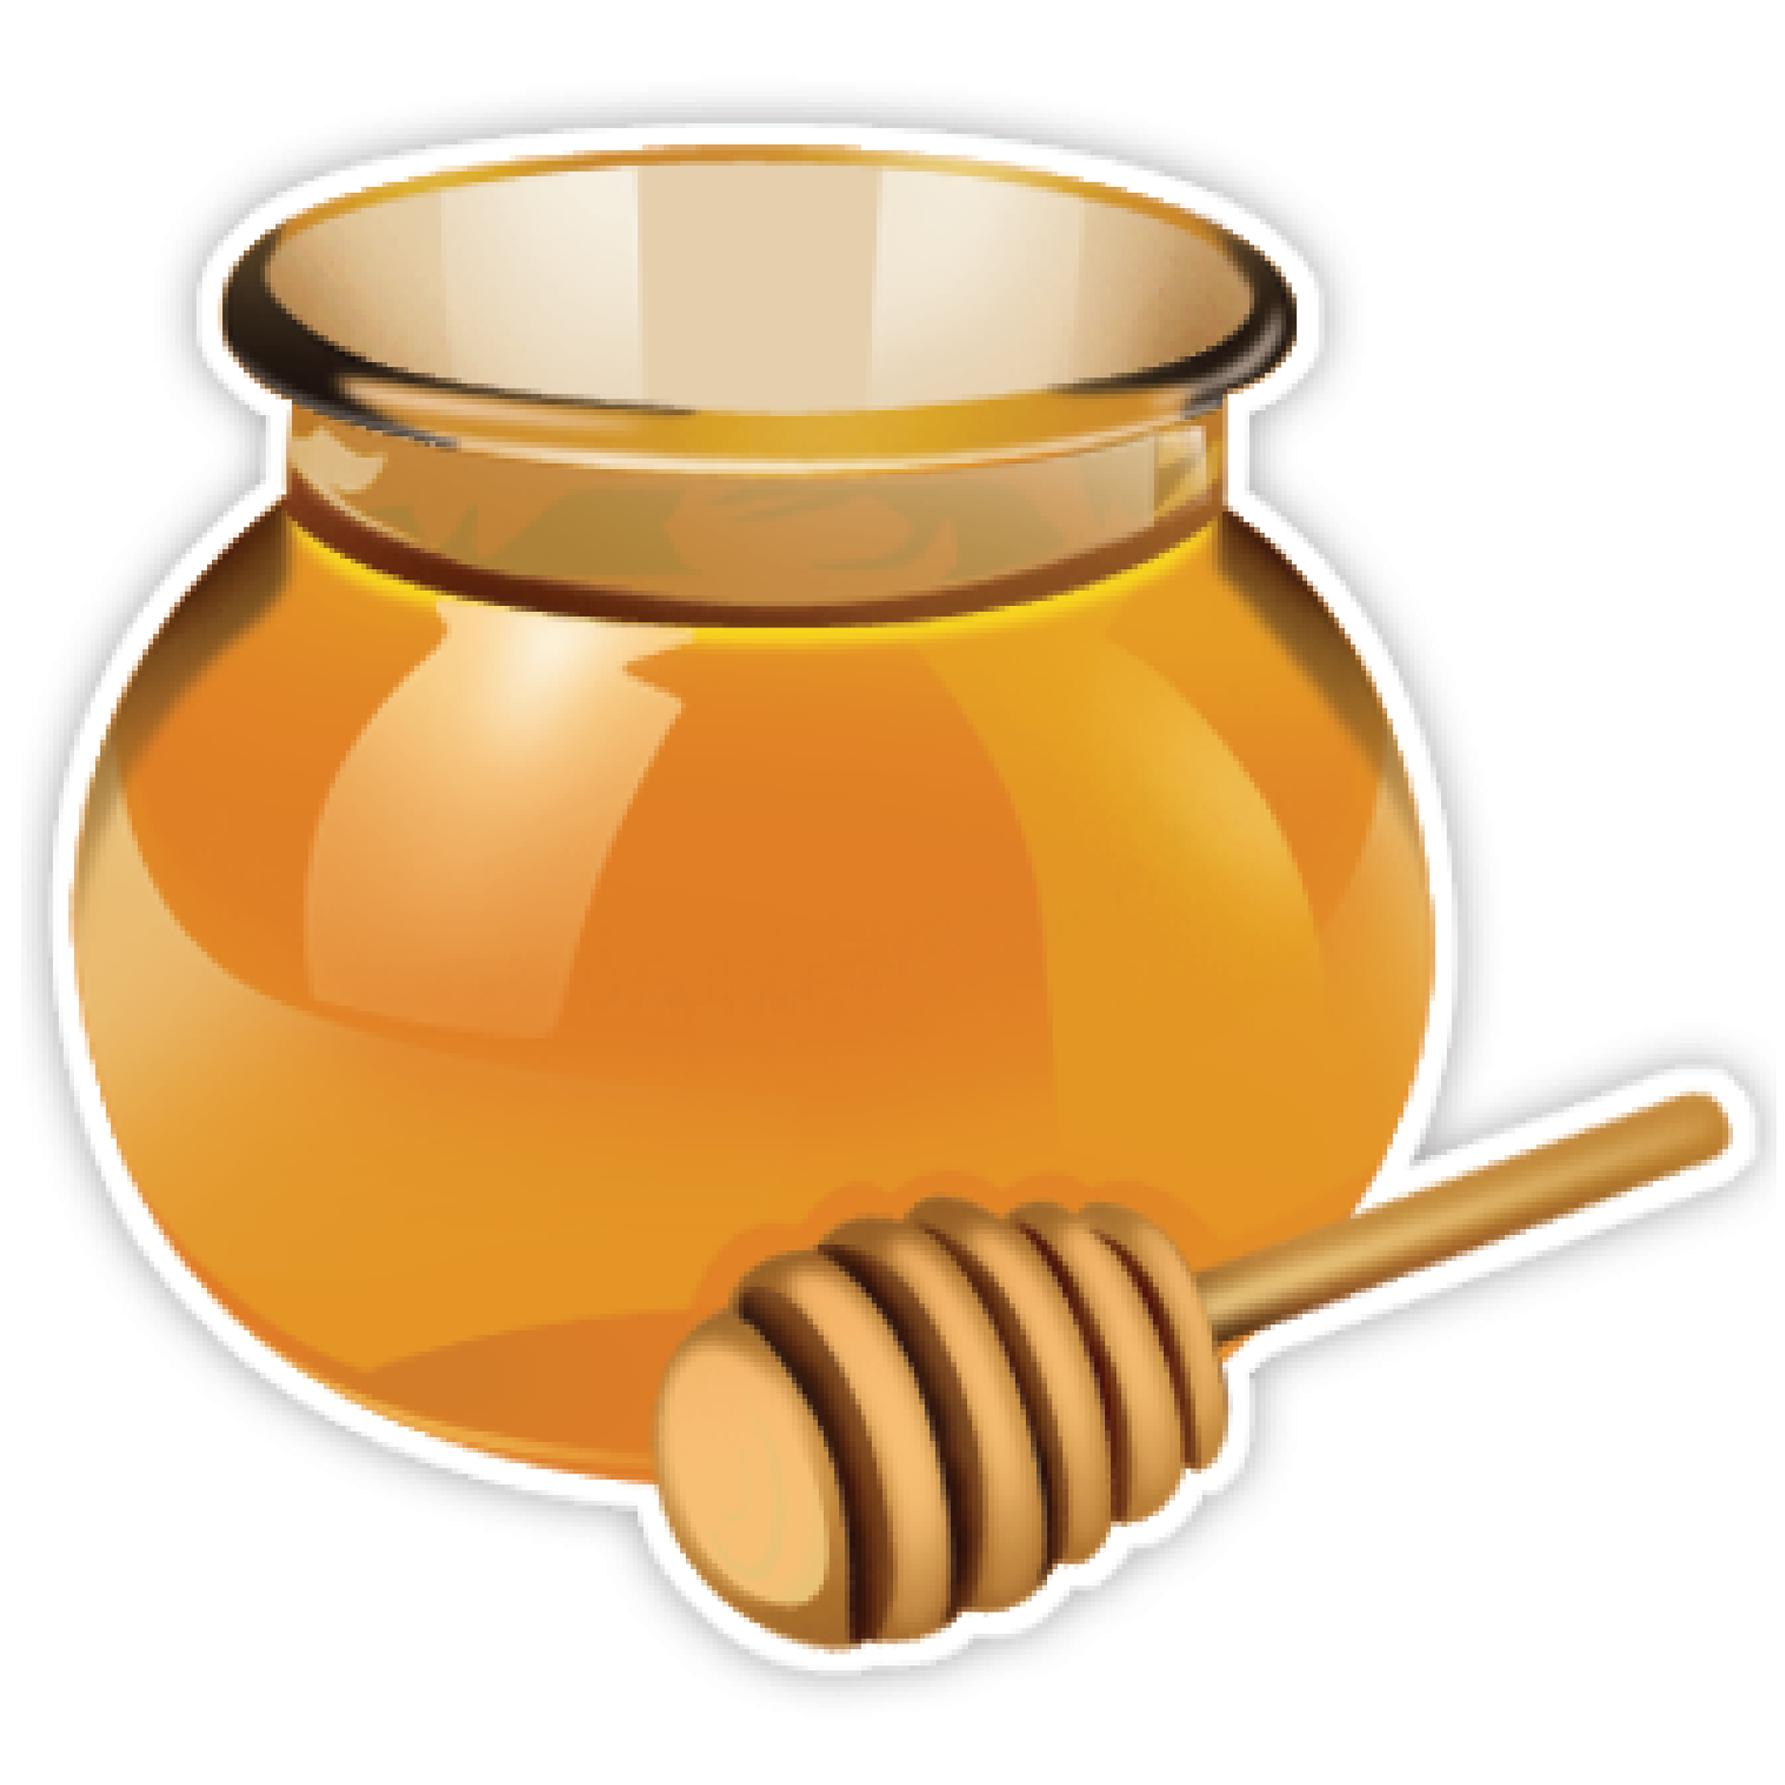 Honey clipart. Free jar cliparts download